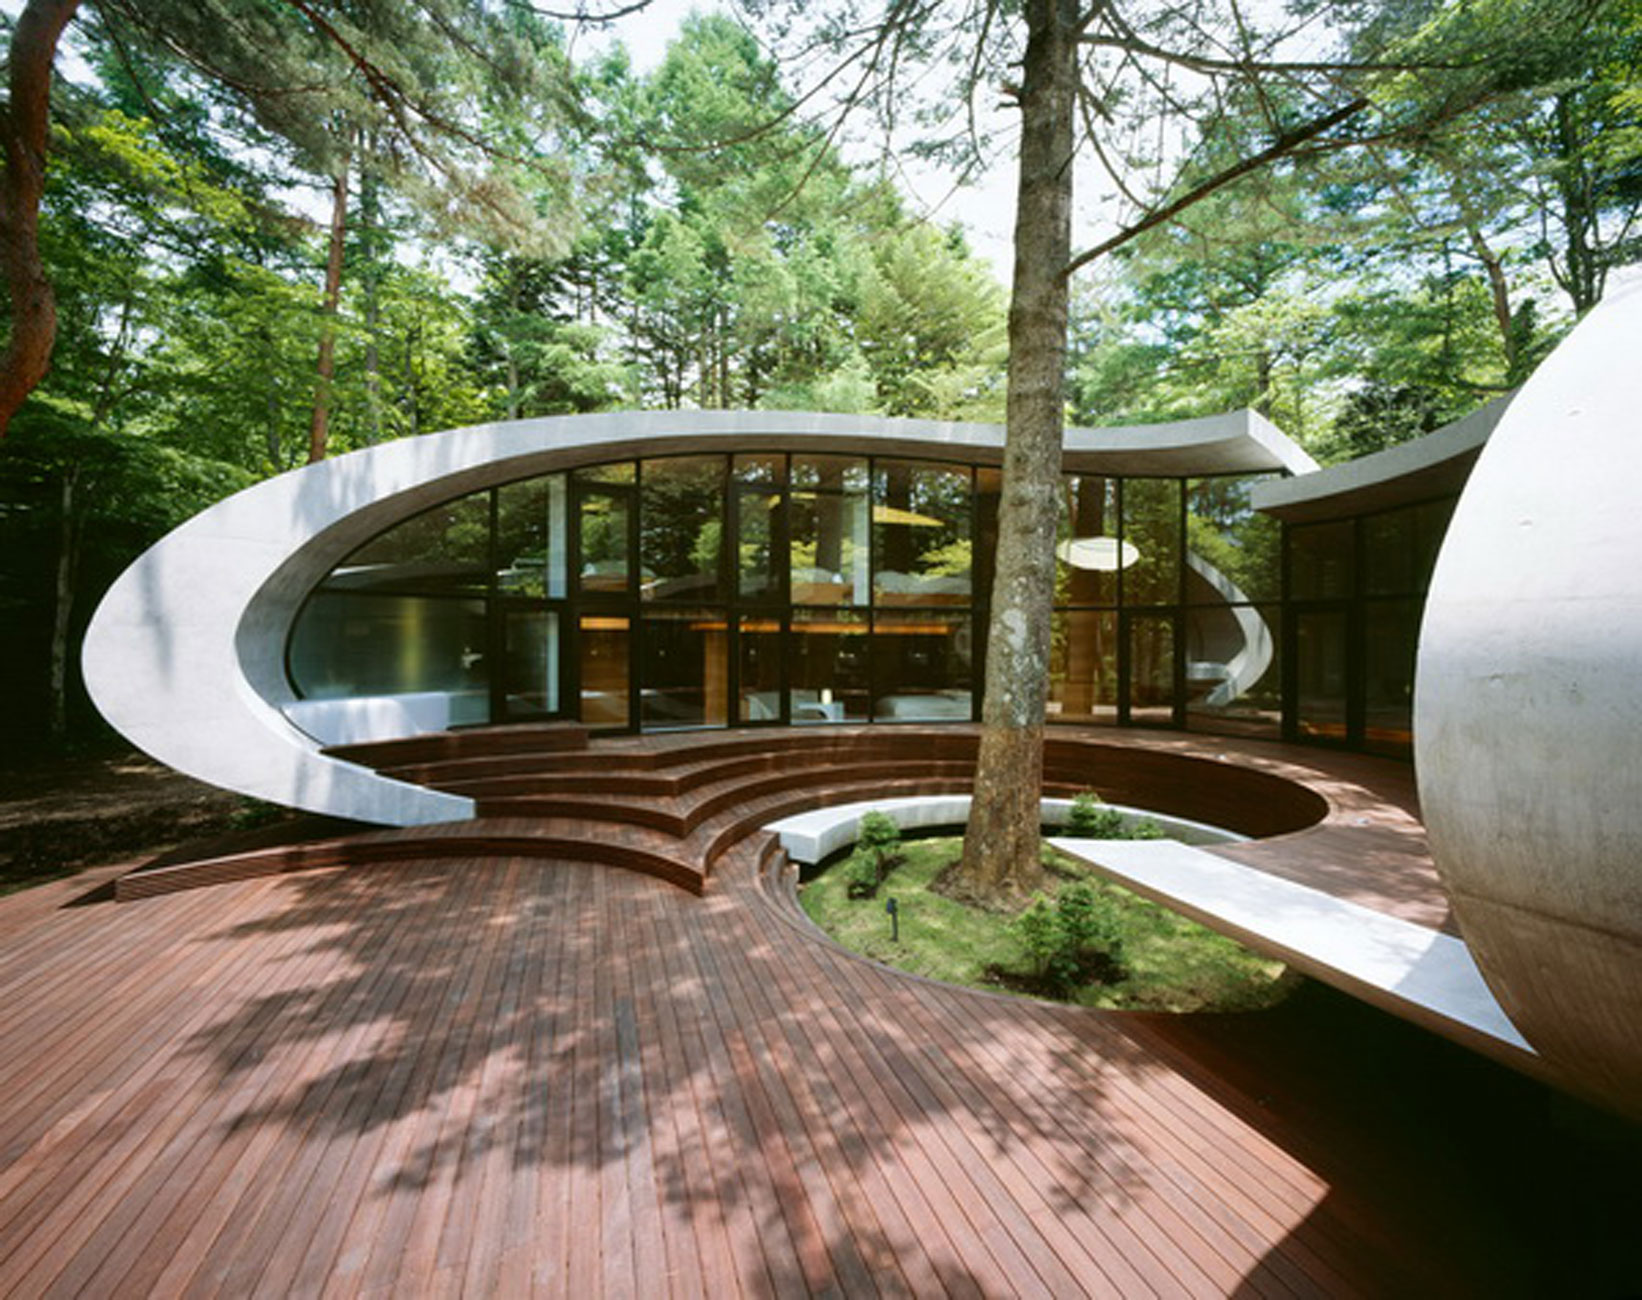 Design Of Garden Homes garden house design – home design and decorating